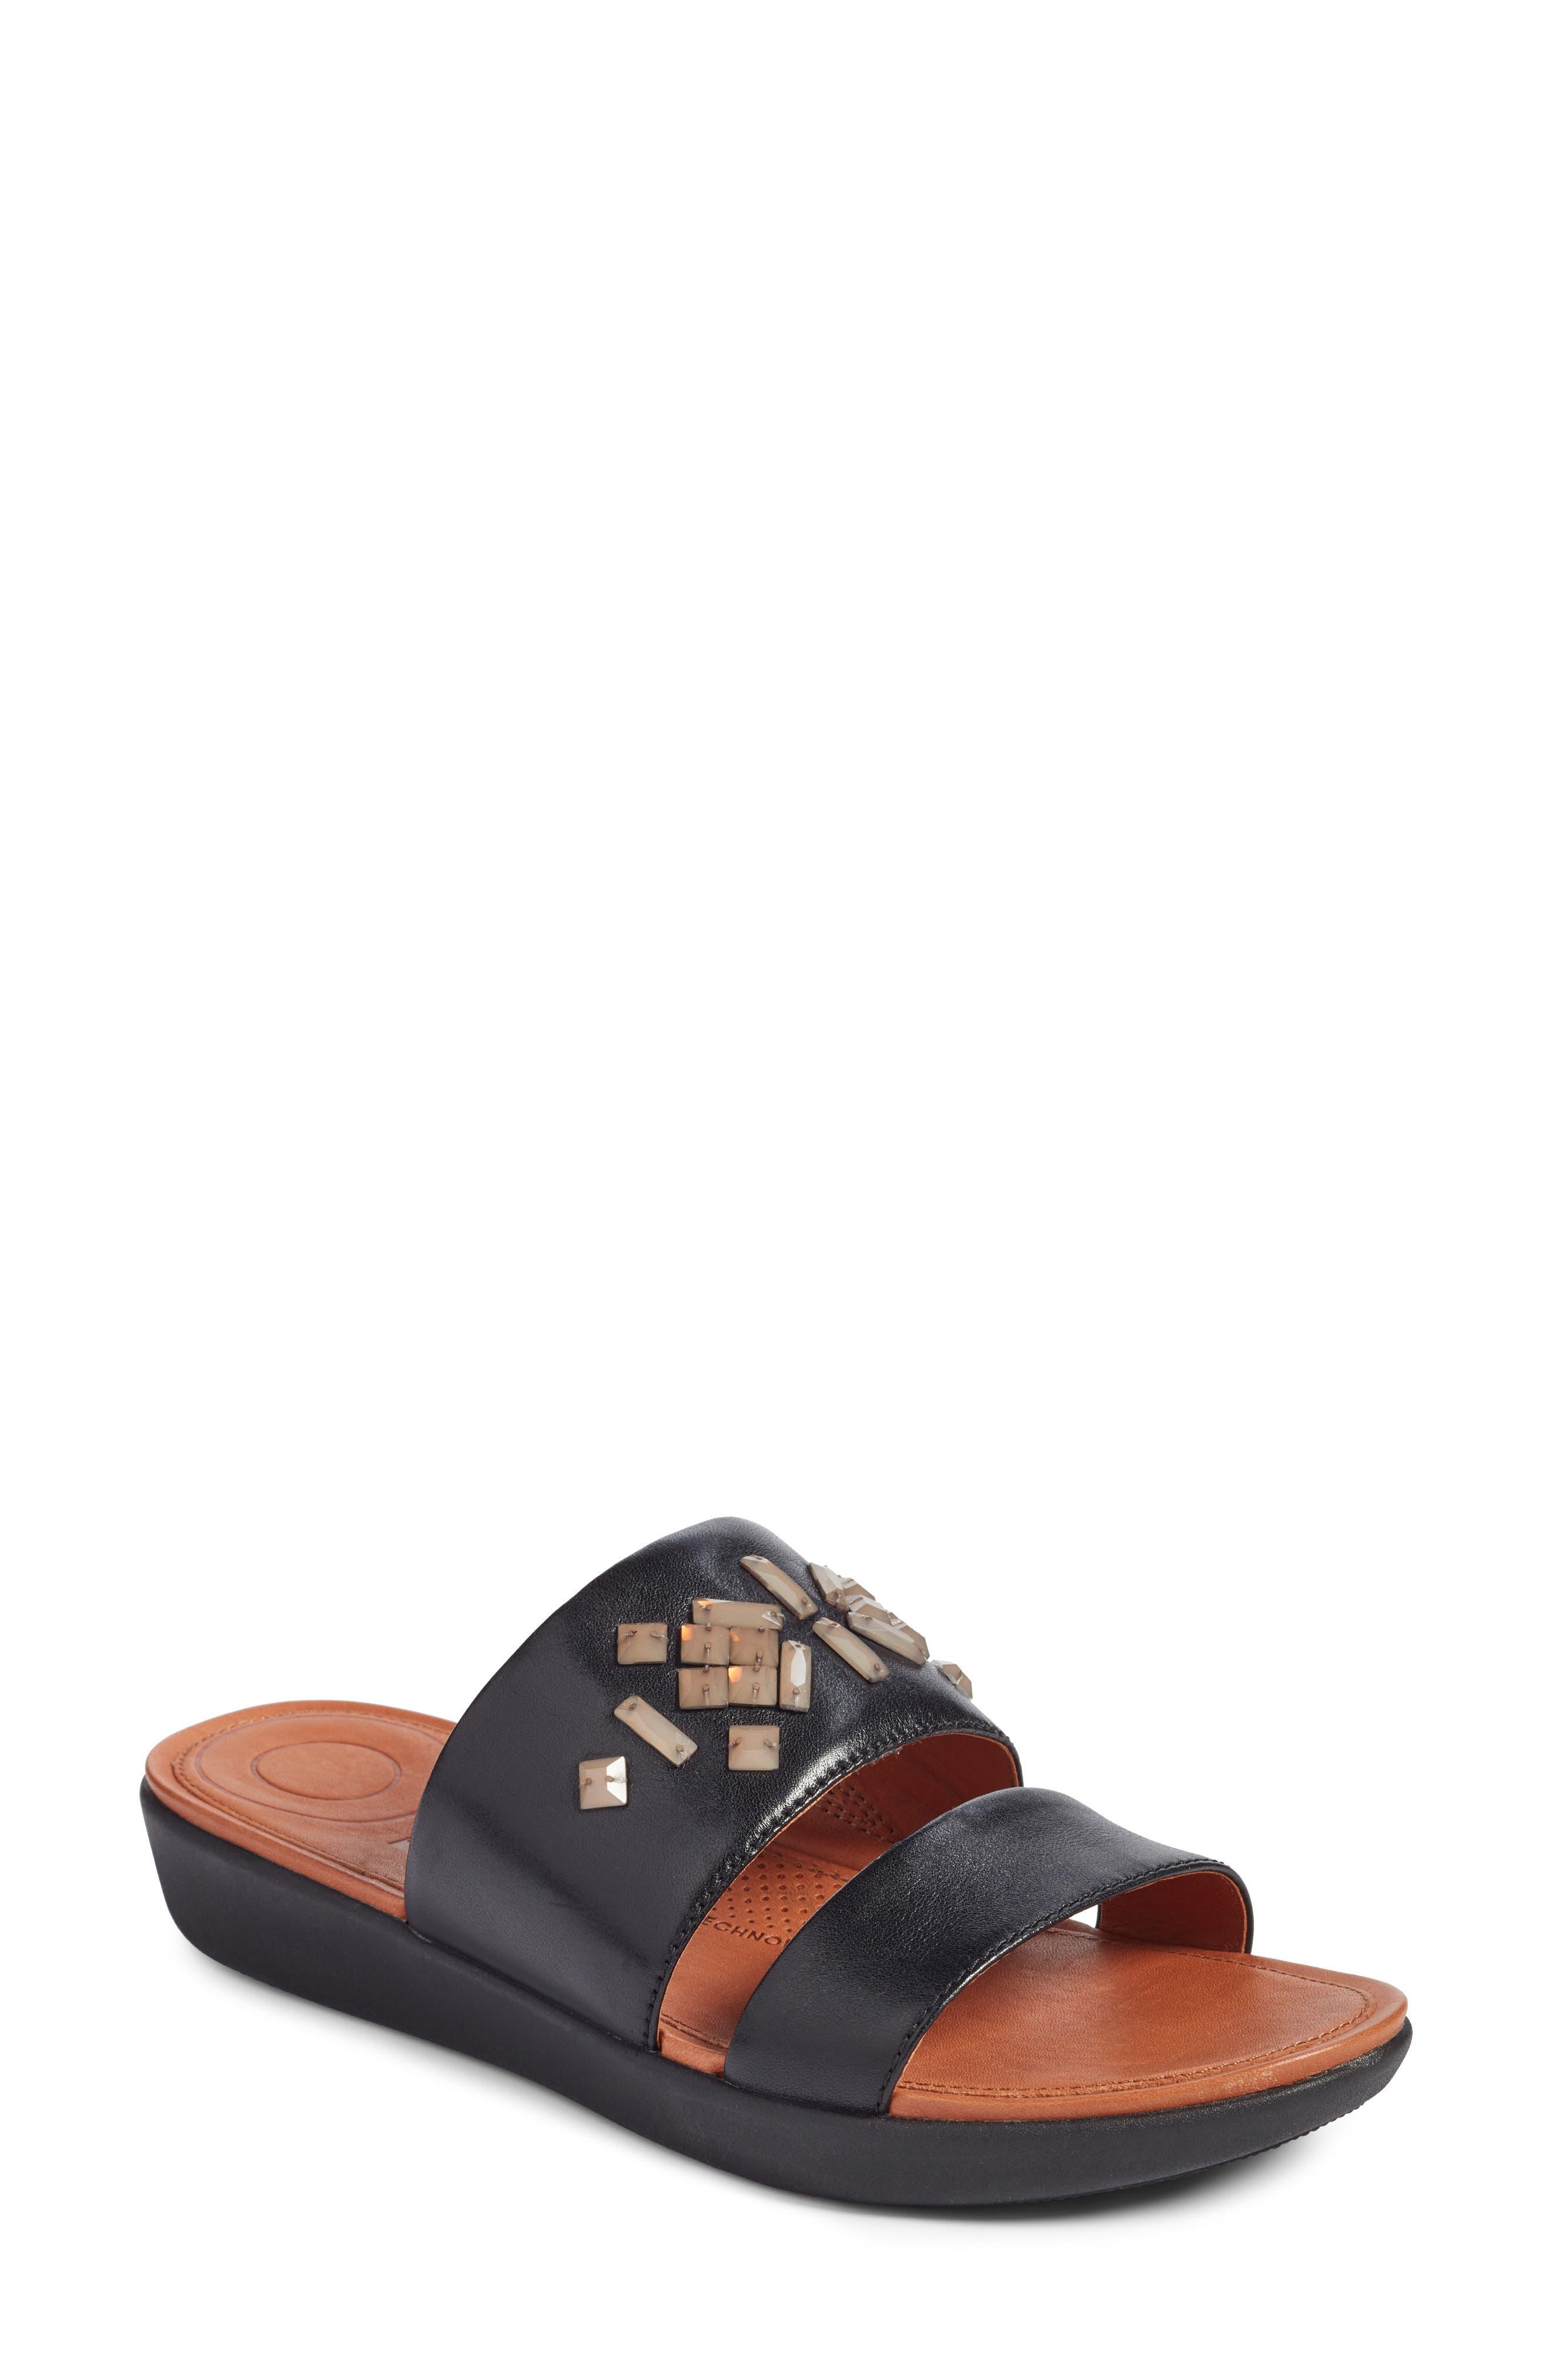 Delta Slide Sandal,                             Main thumbnail 1, color,                             BLACK LEATHER